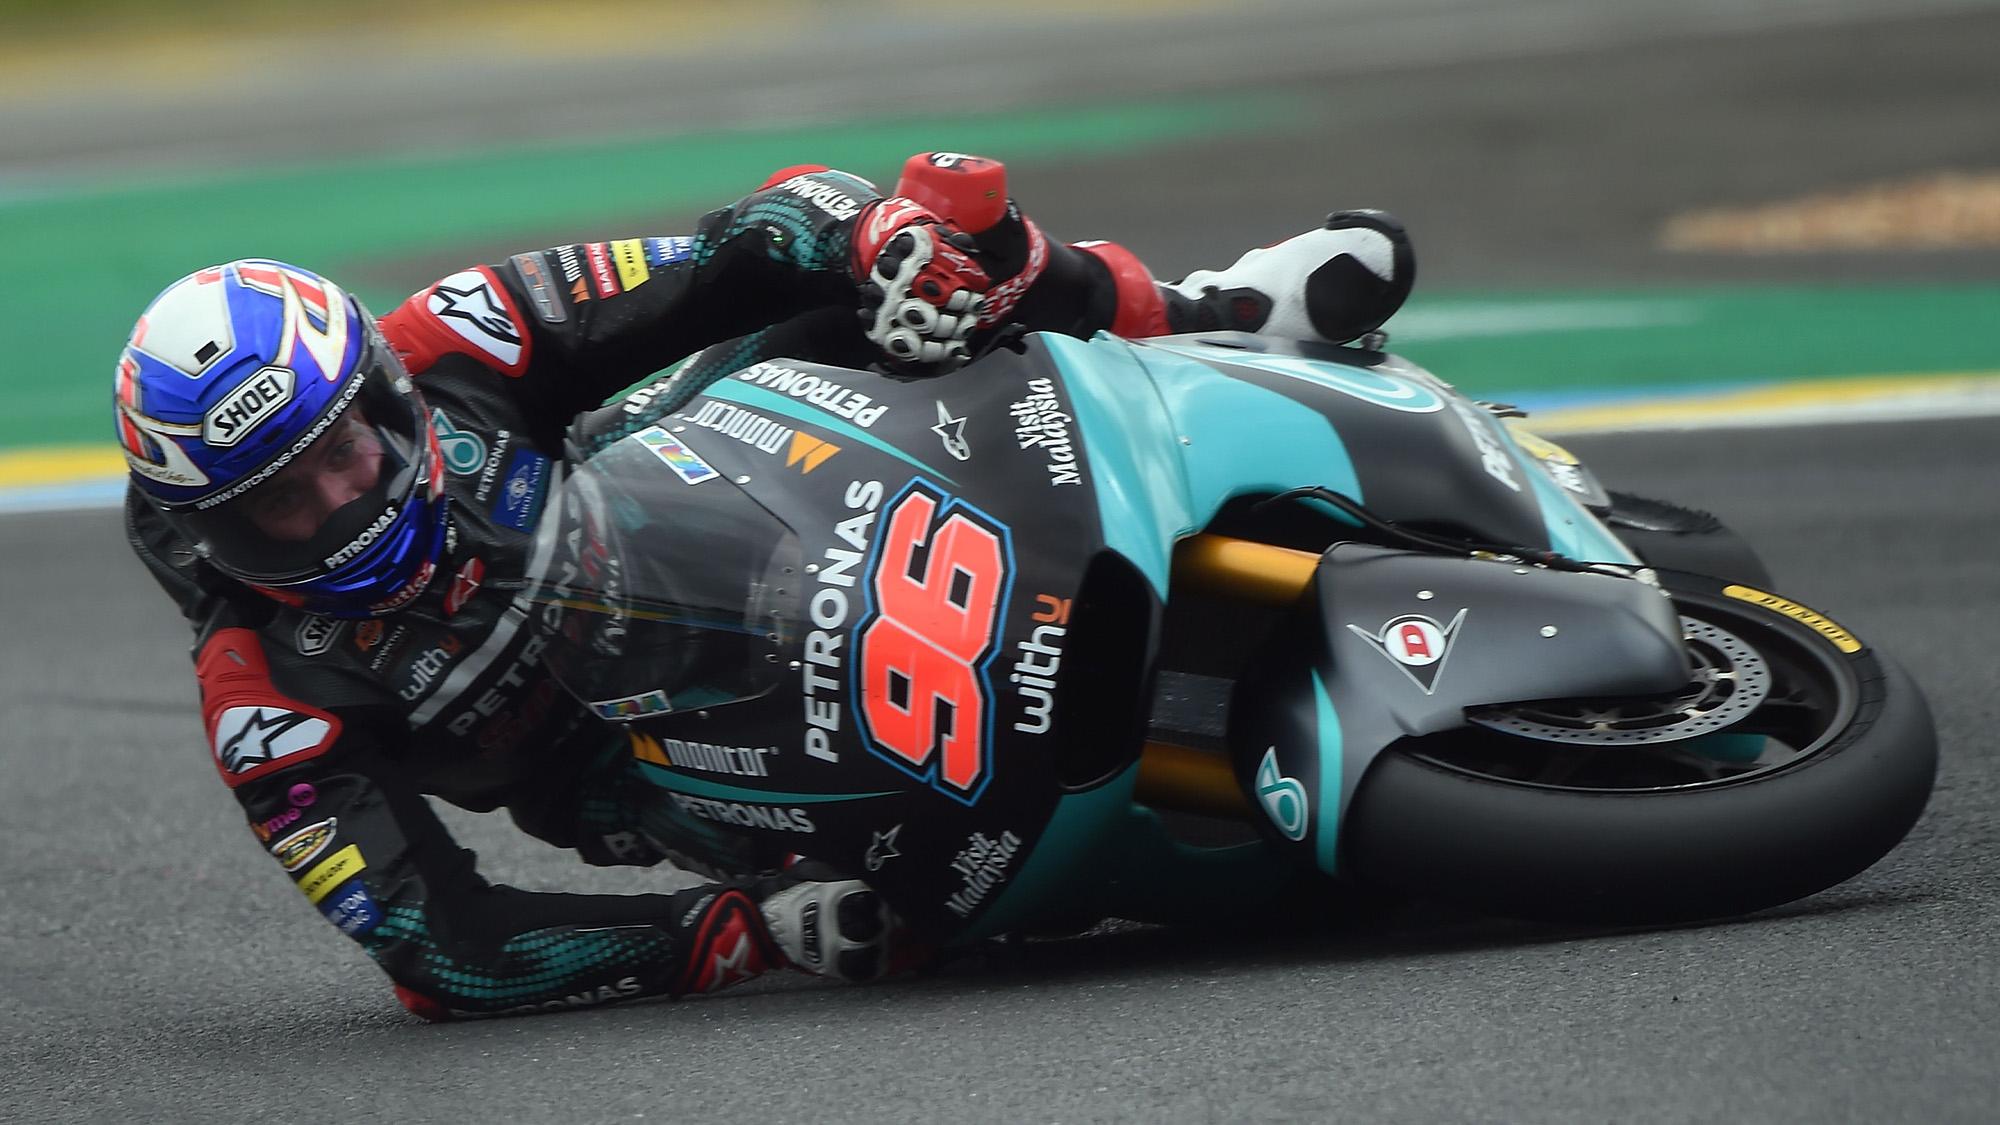 Jake Dixon falls during the 2020 Moto2 Le Mans race